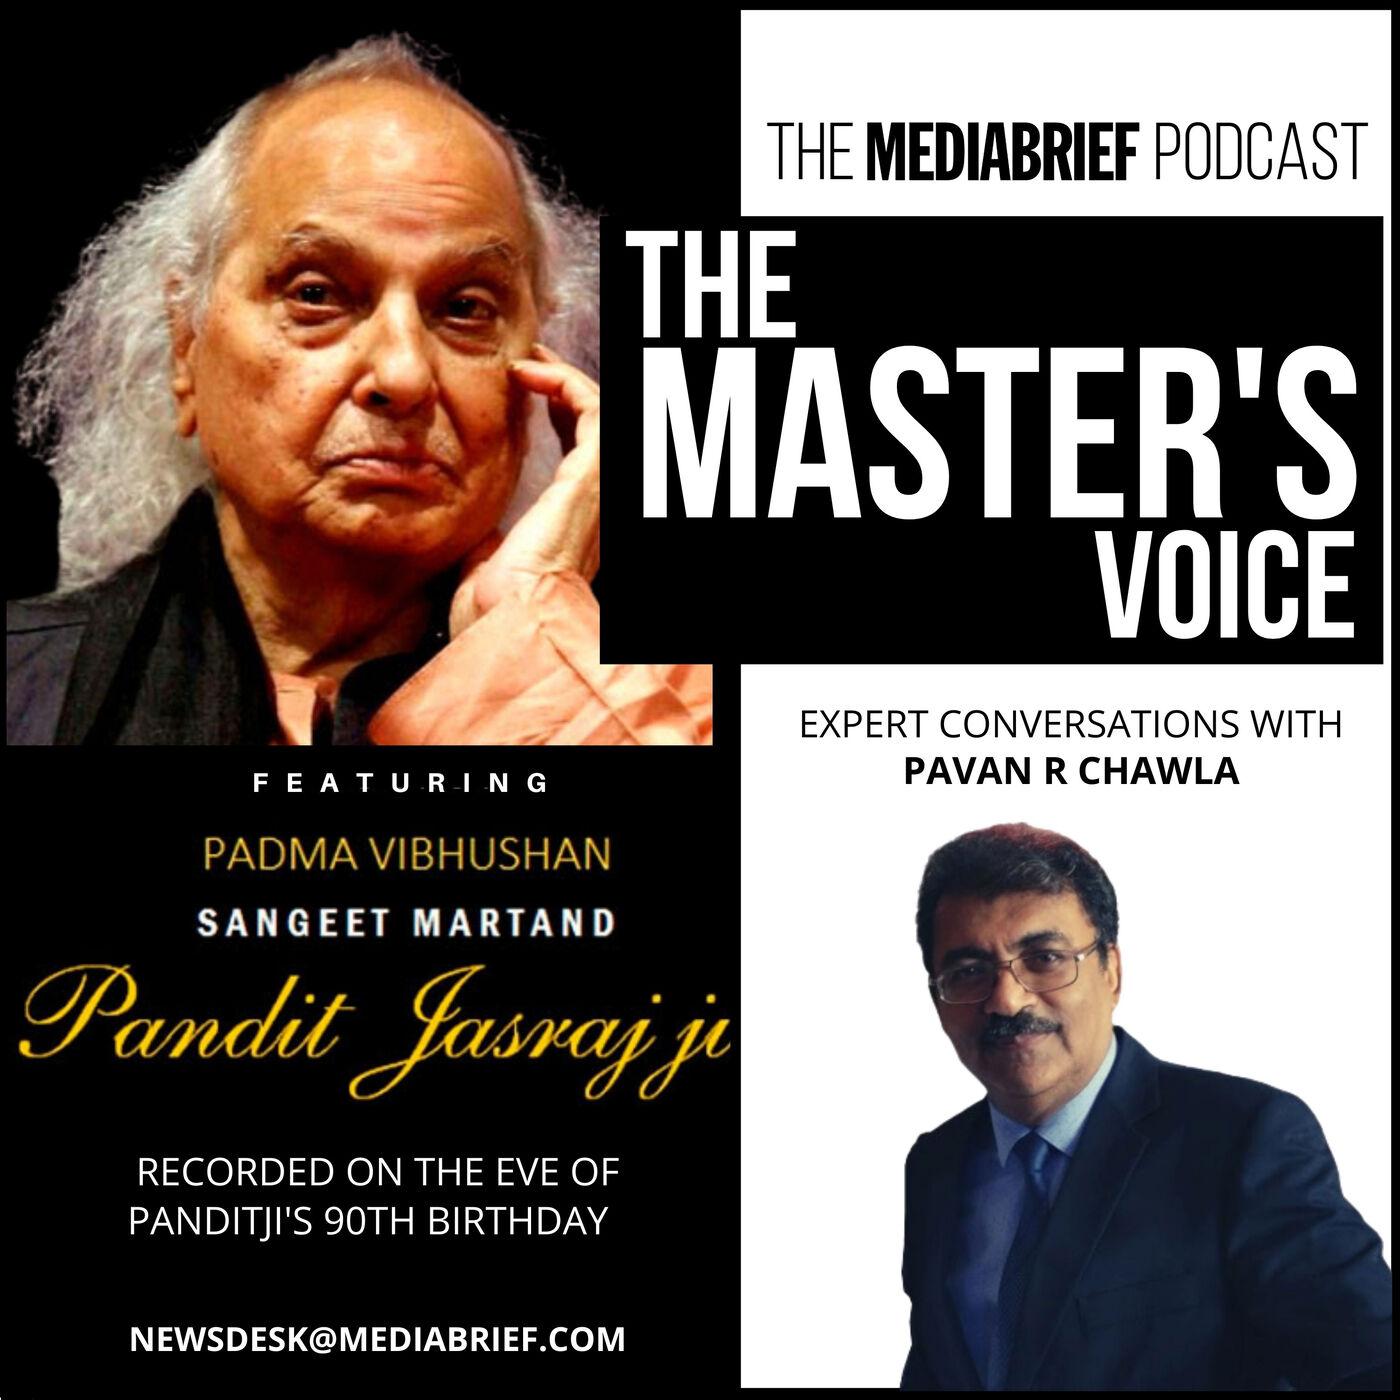 PODCAST: Pandit Jasraj ji, on The Master's Voice